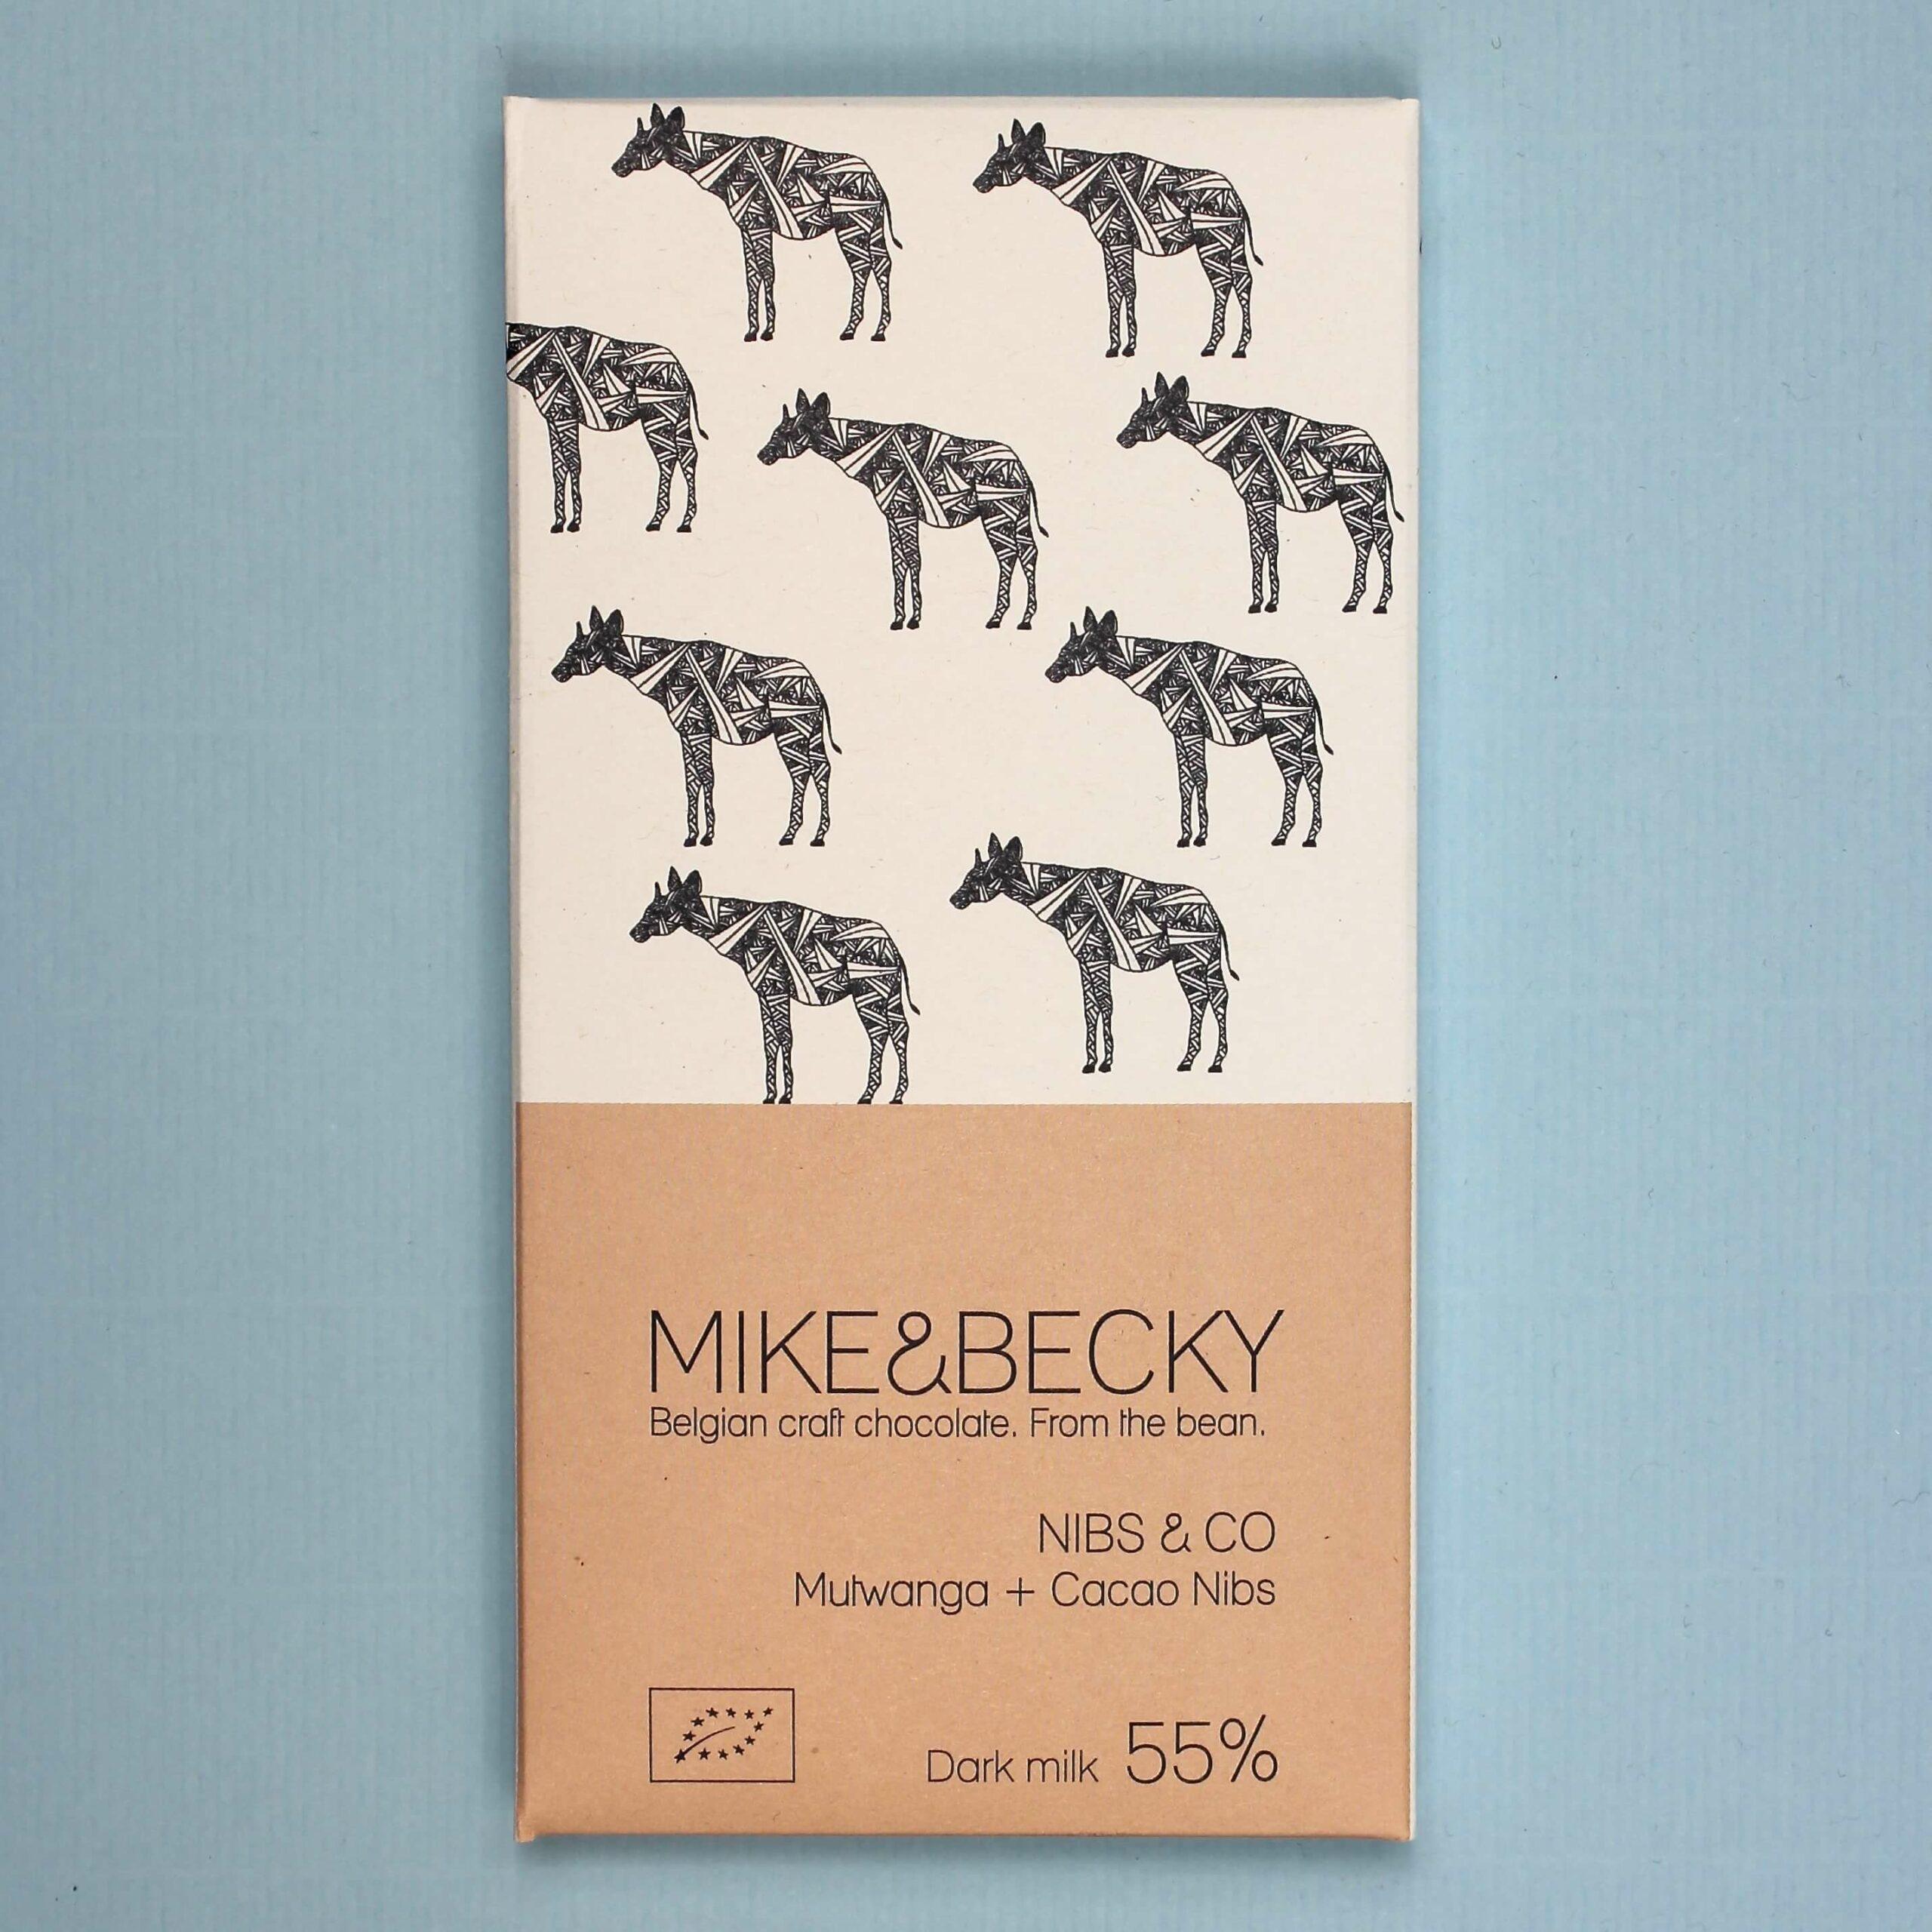 mike becky nibs co mutwanga congo cacao nibs 55